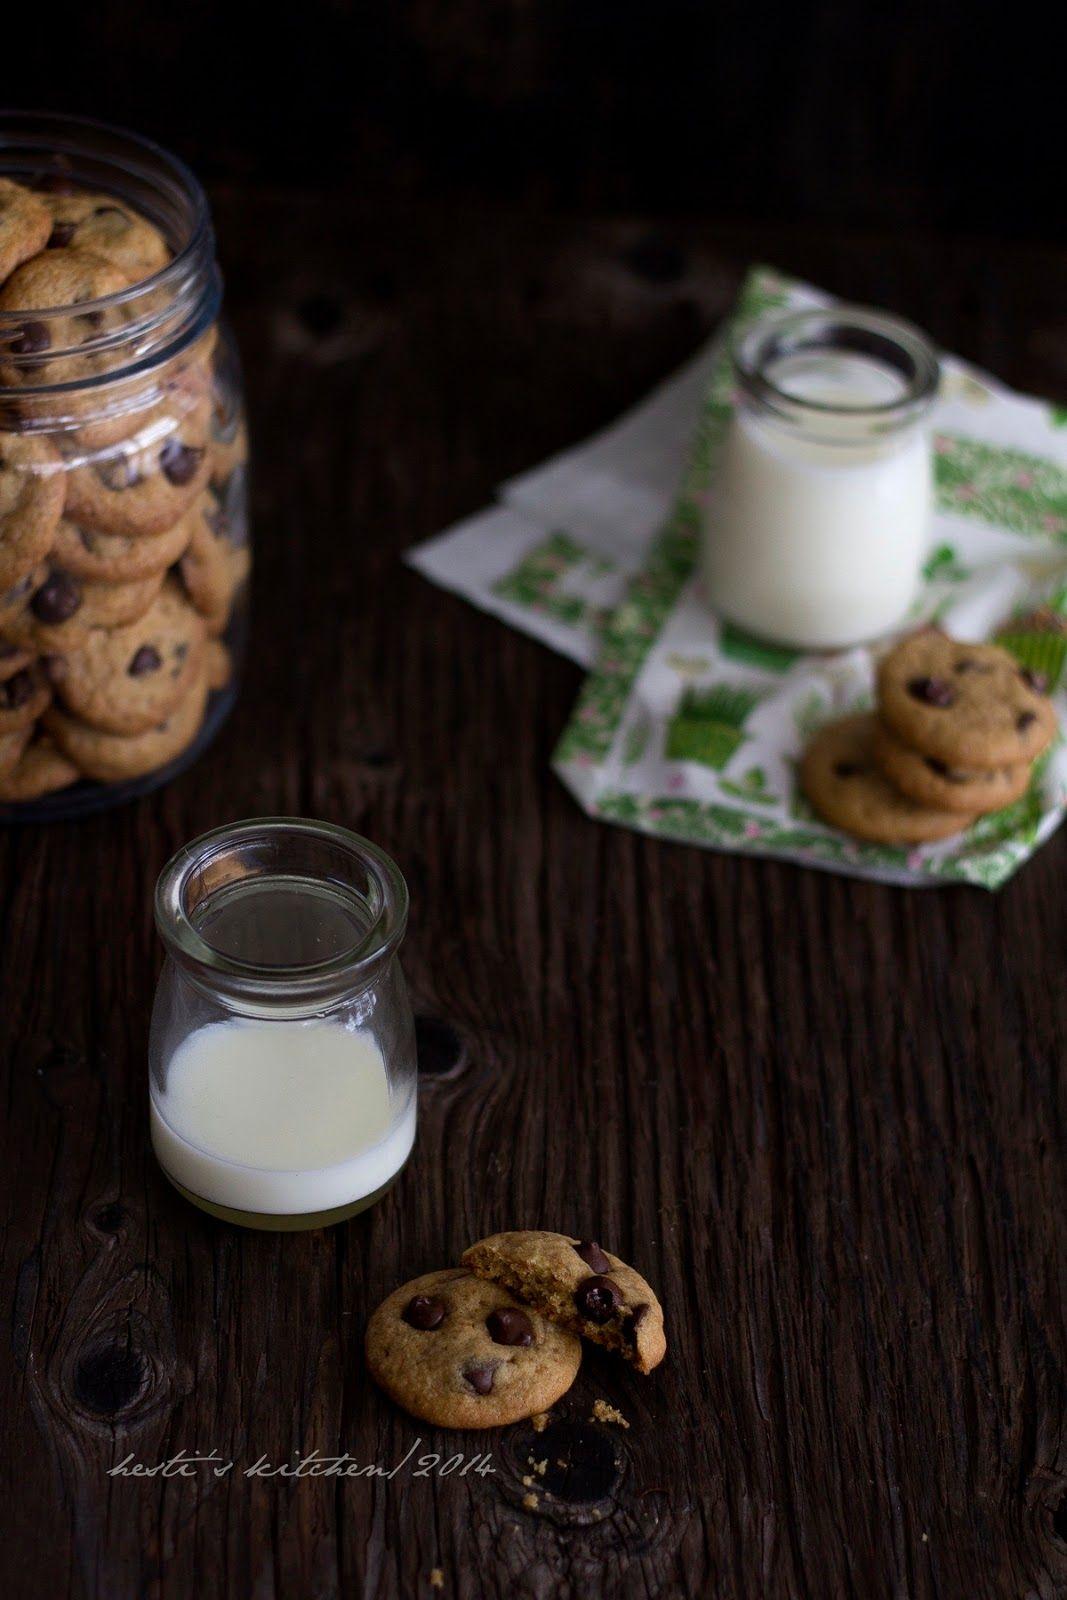 Hesti S Kitchen Yummy For Your Tummy Chocolate Chip Cookies Kue Coklat Chip Keping Coklat Kue Coklat